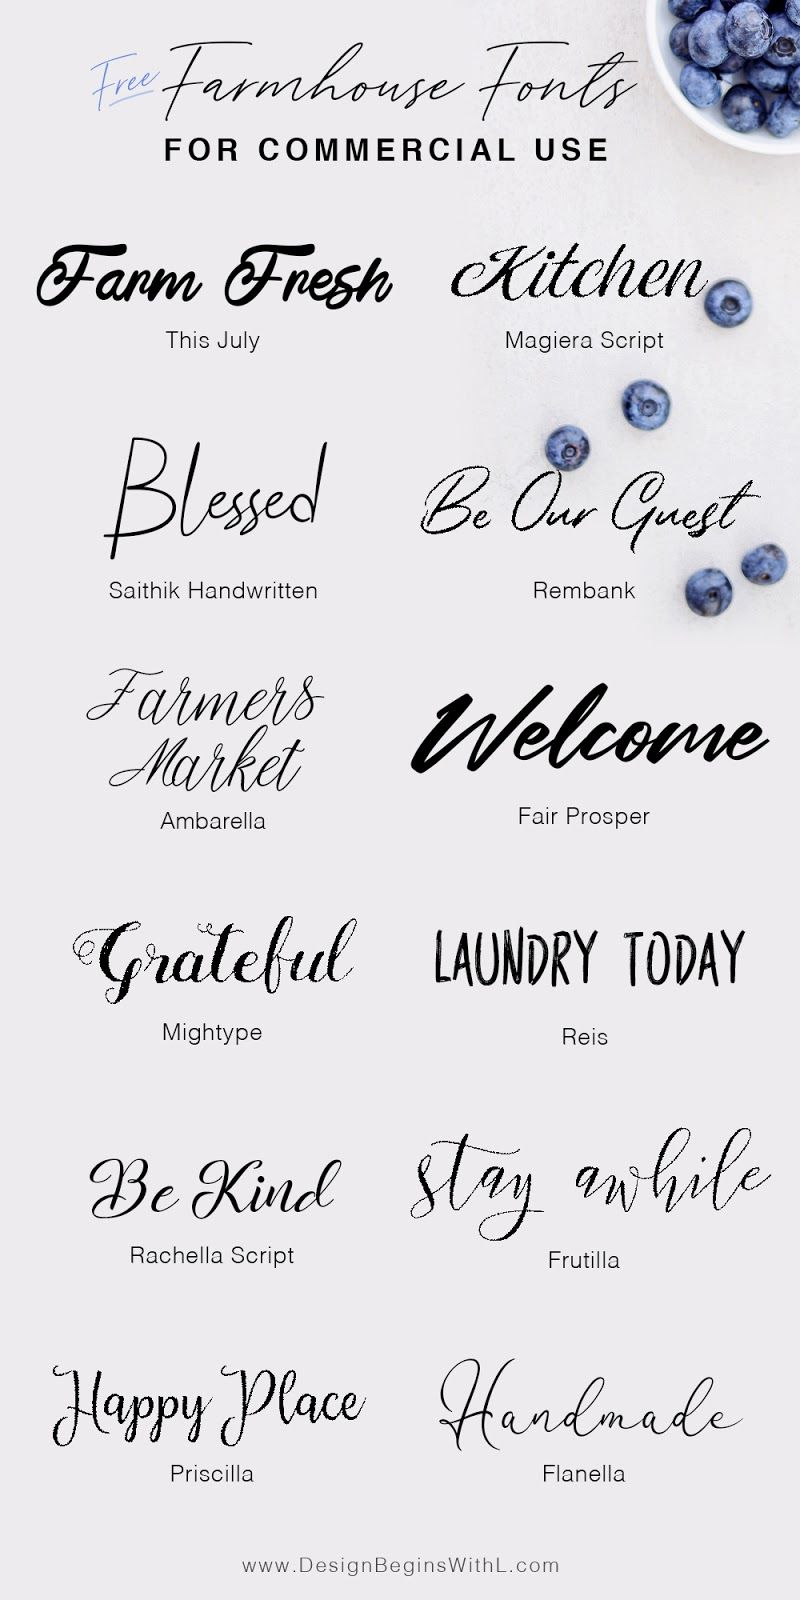 12 Free Farmhouse Fonts For Commercial Use Farmhouse